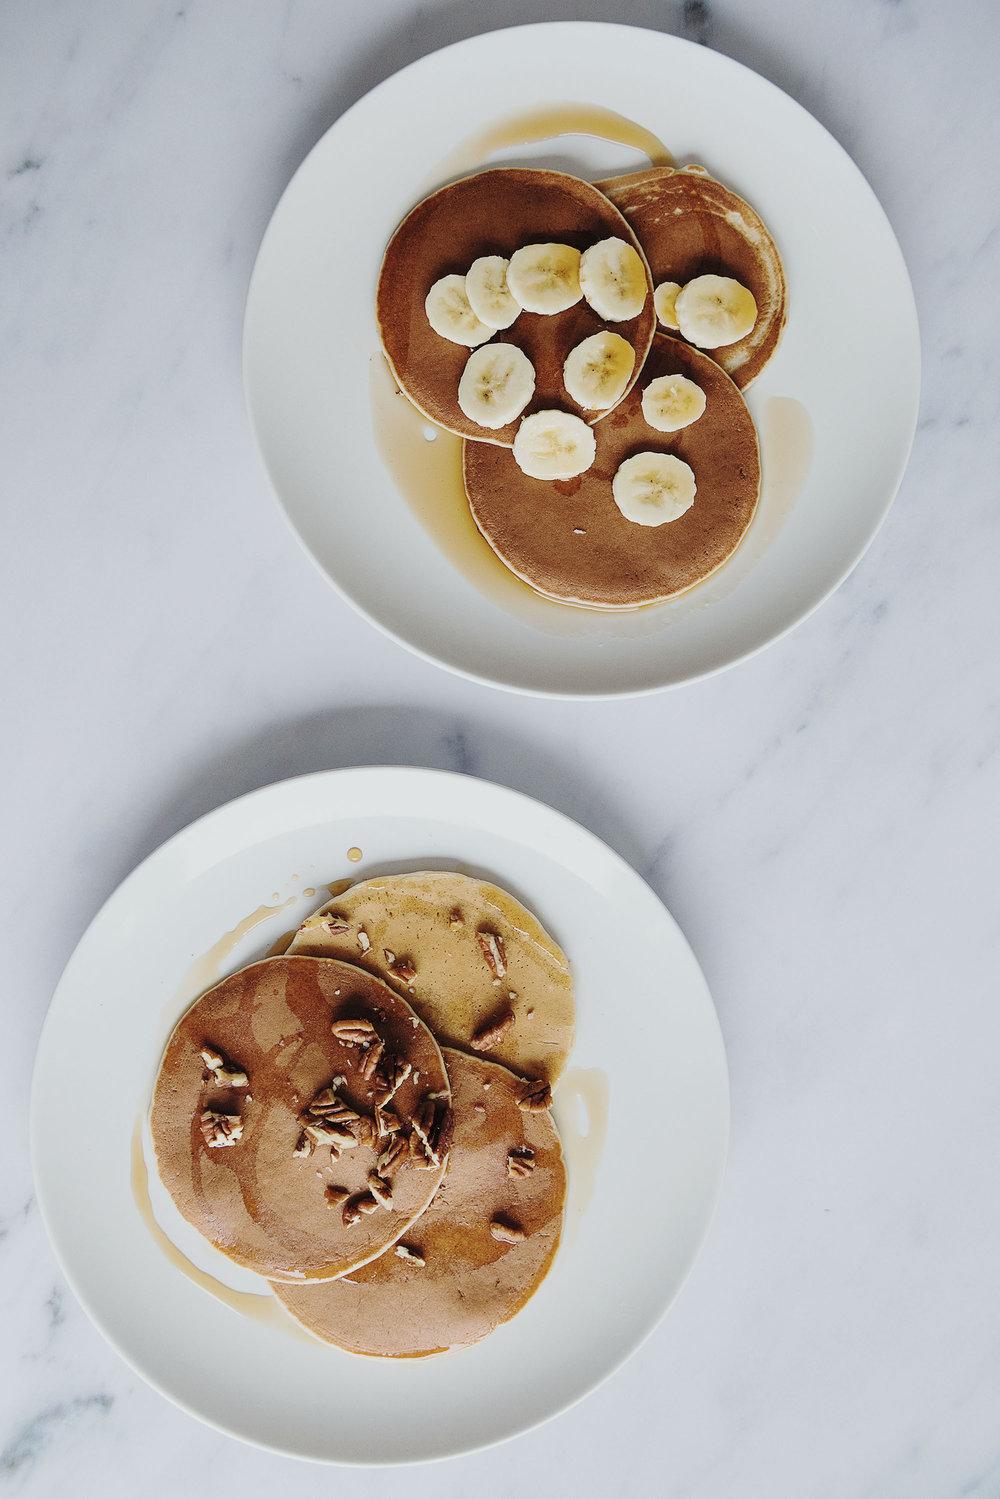 ragnhild-utne-eatbud-eat-bud-banana-pancakes-recipe-healthy-food-blog-3.jpg